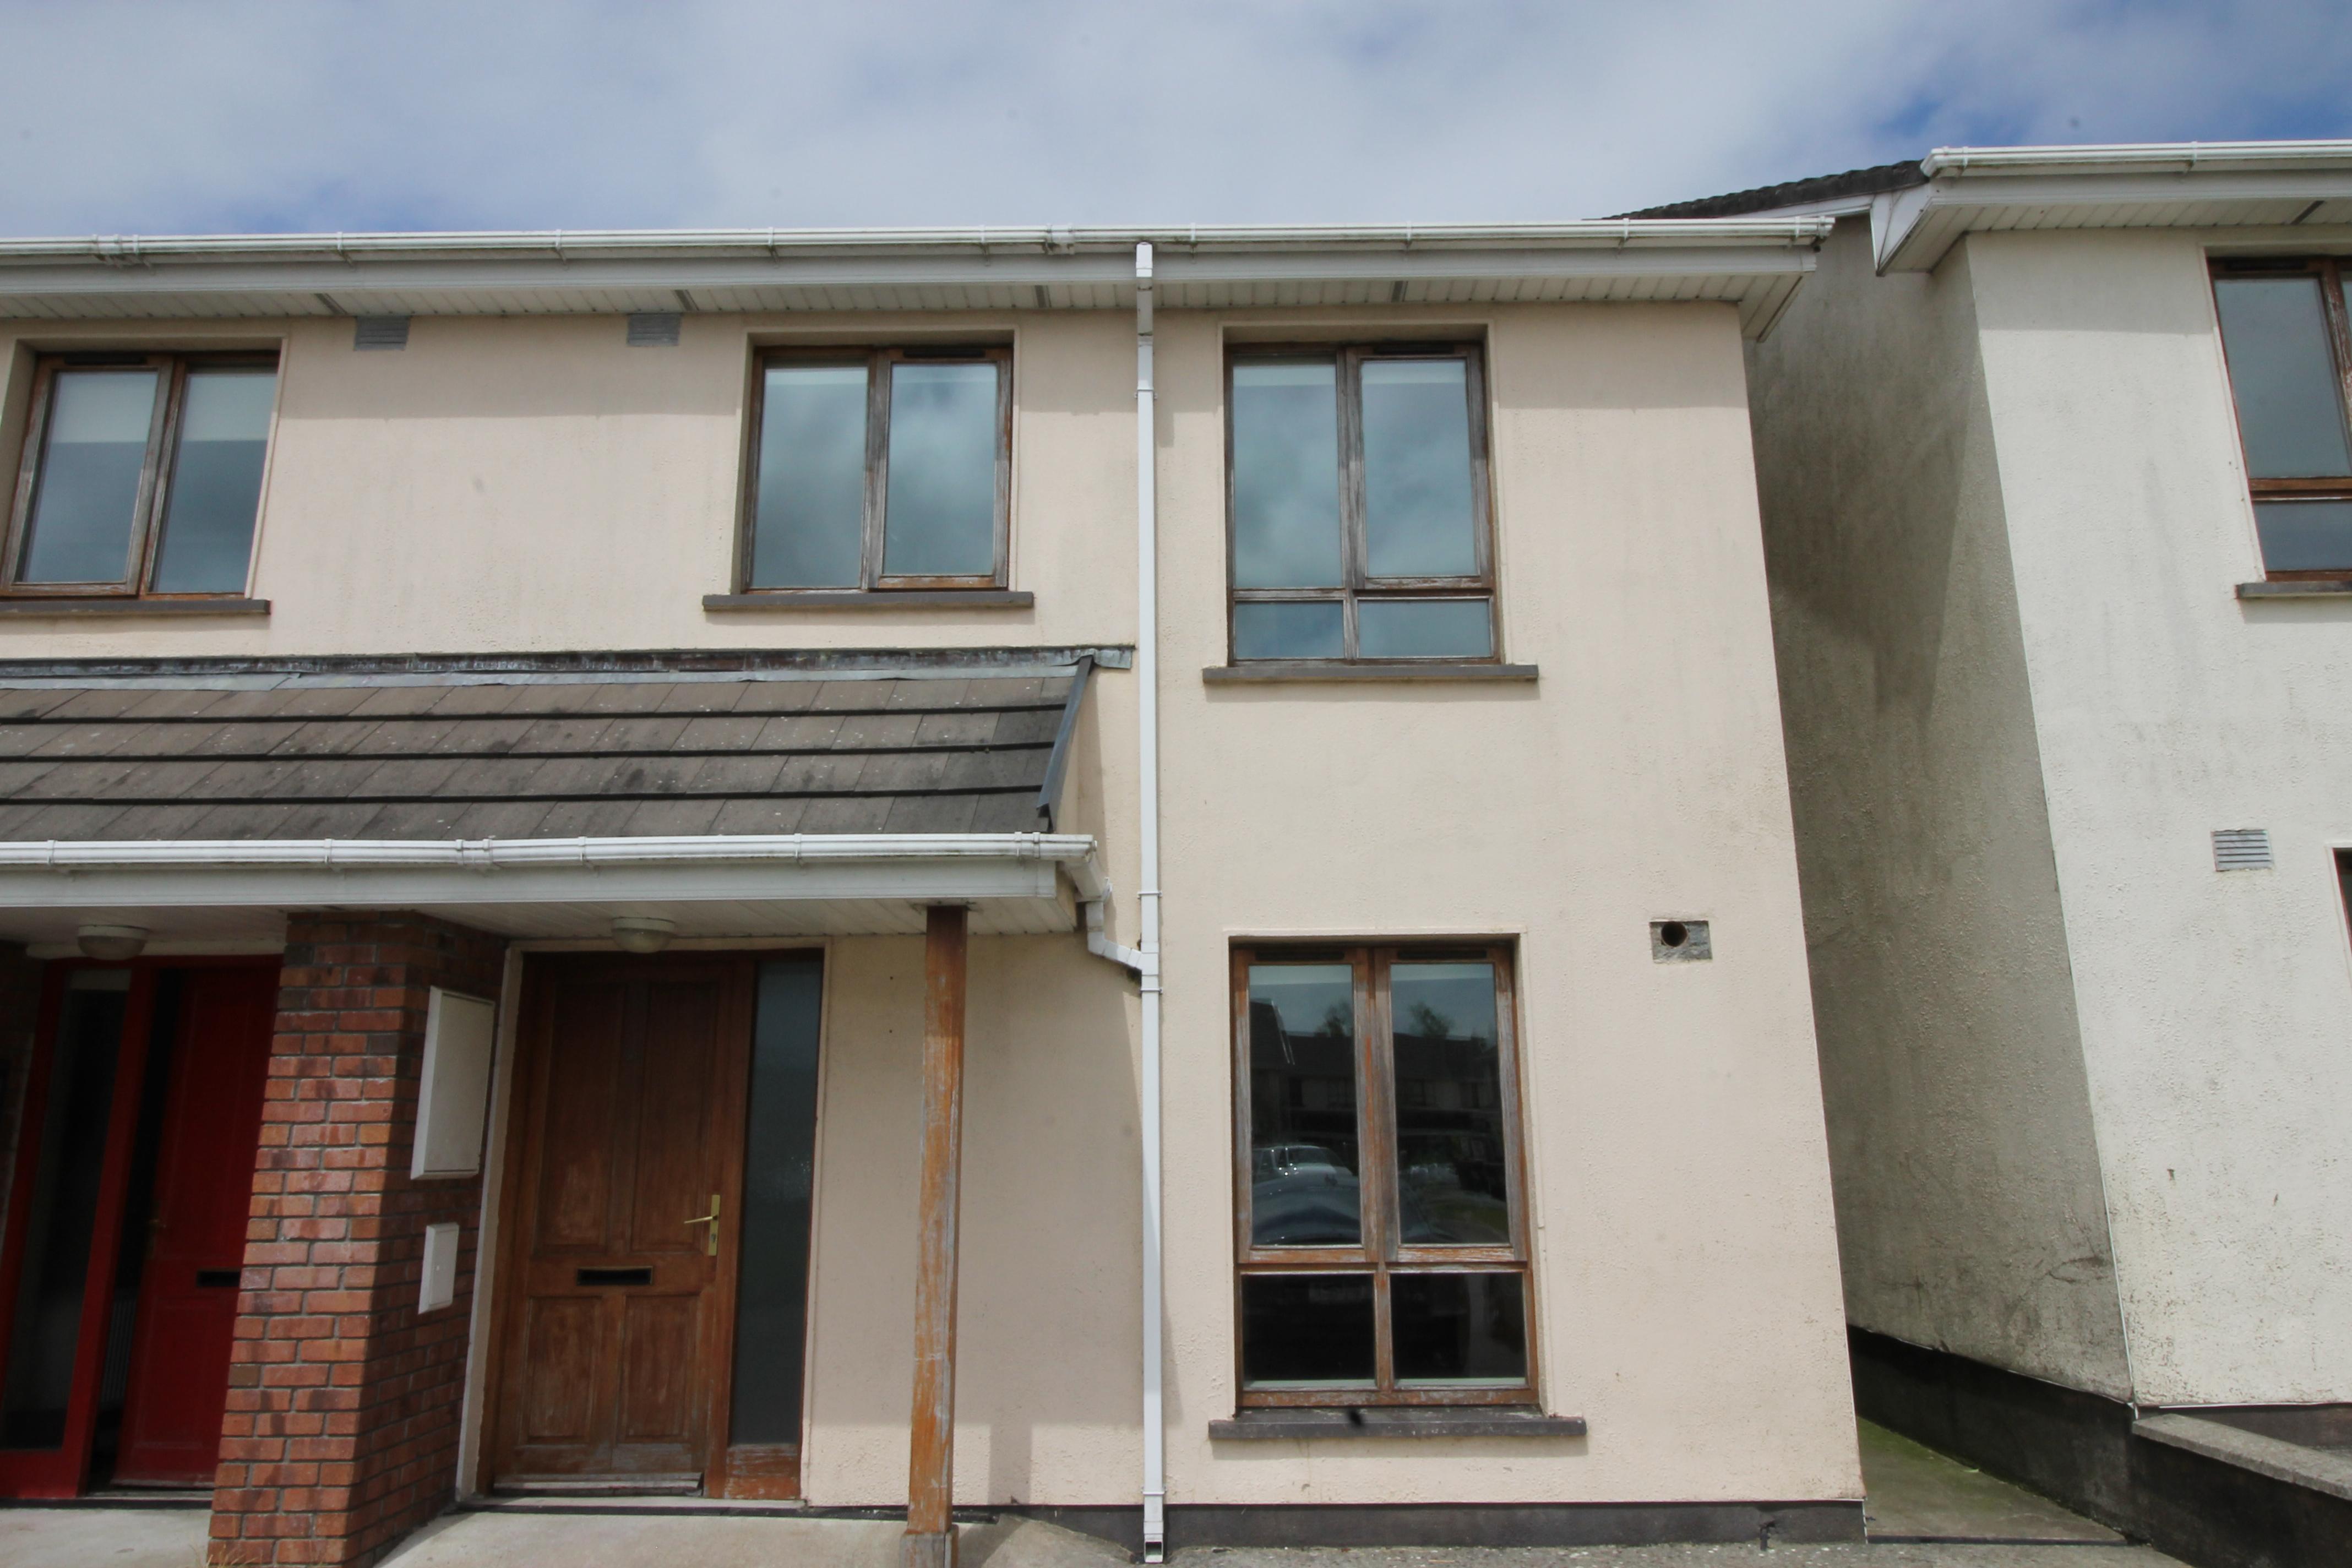 30 Dun Uisce, Cahir, Co. Tipperary, E21 EV52